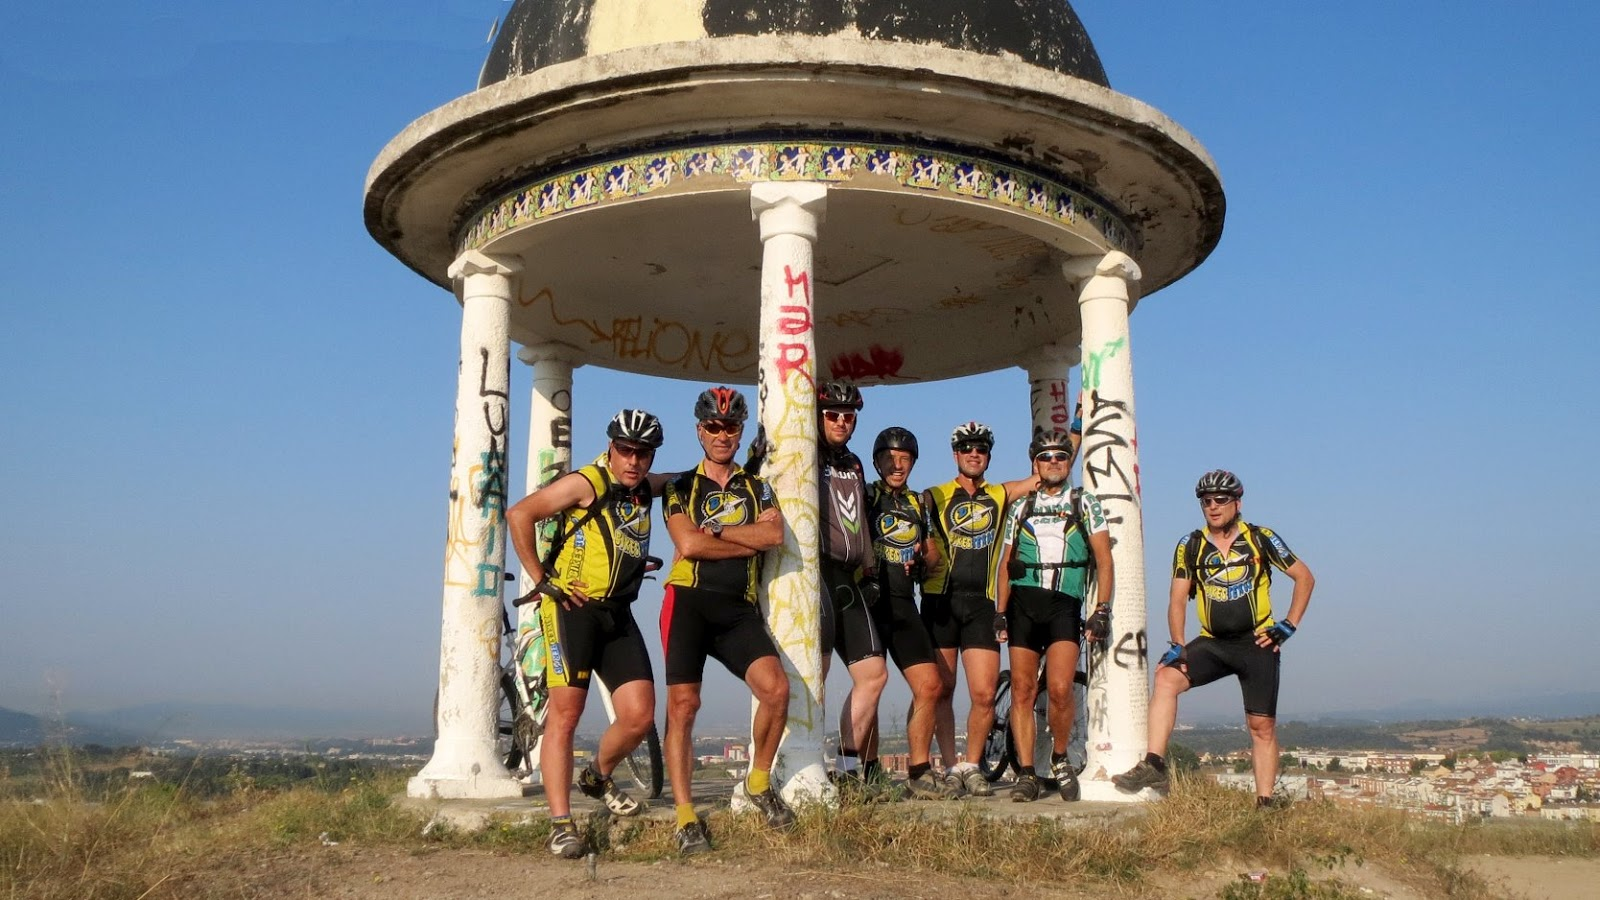 Bikesteros En Btt Granollers El Corredor